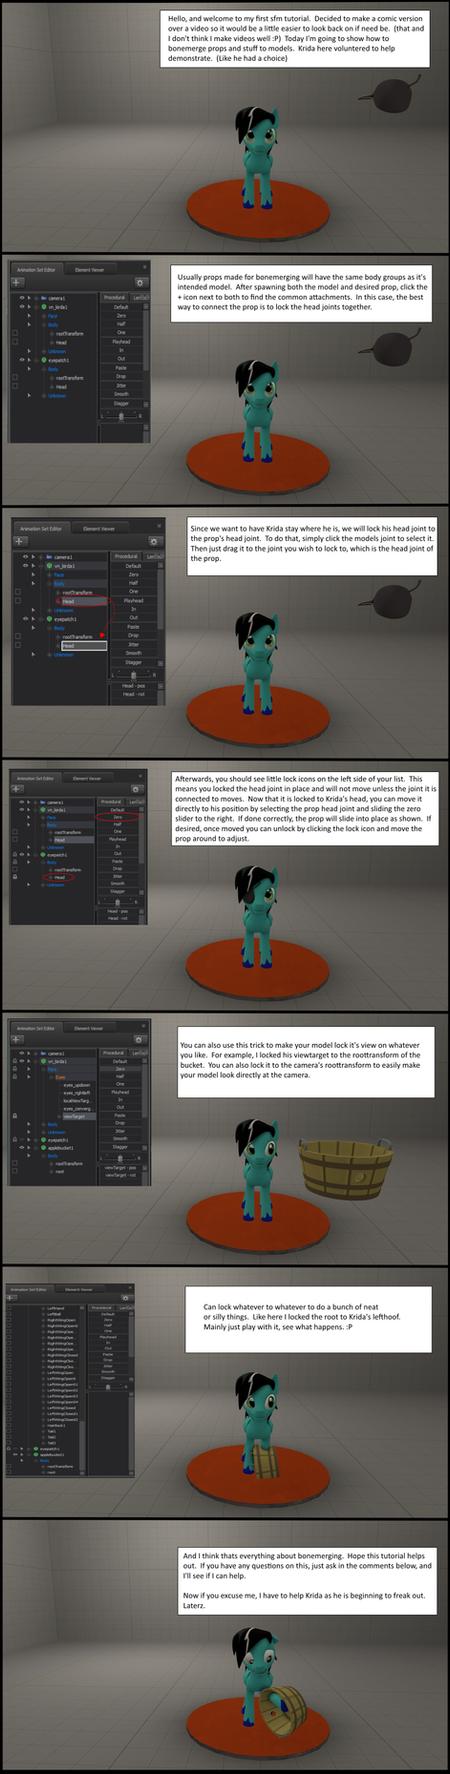 Sfm tutorial bonemerge tutorial by krida2 on deviantart sfm tutorial bonemerge tutorial by krida2 baditri Gallery